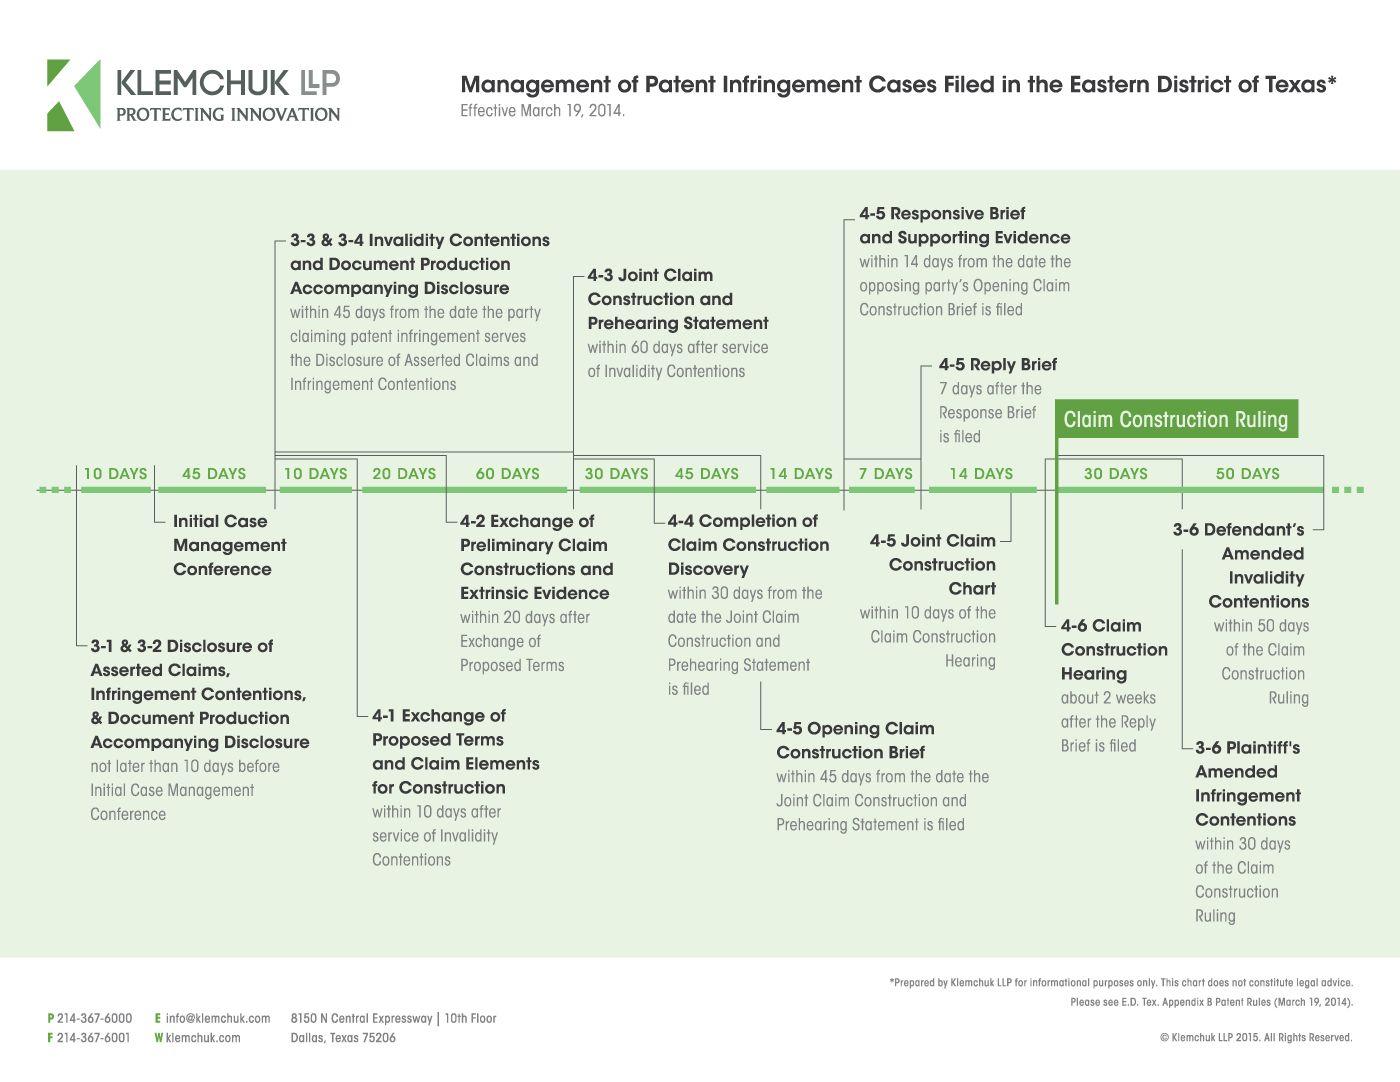 Infographic Edtx Patent Rules Timeline Klemchuk Llp Case Management Patent Infringement Management